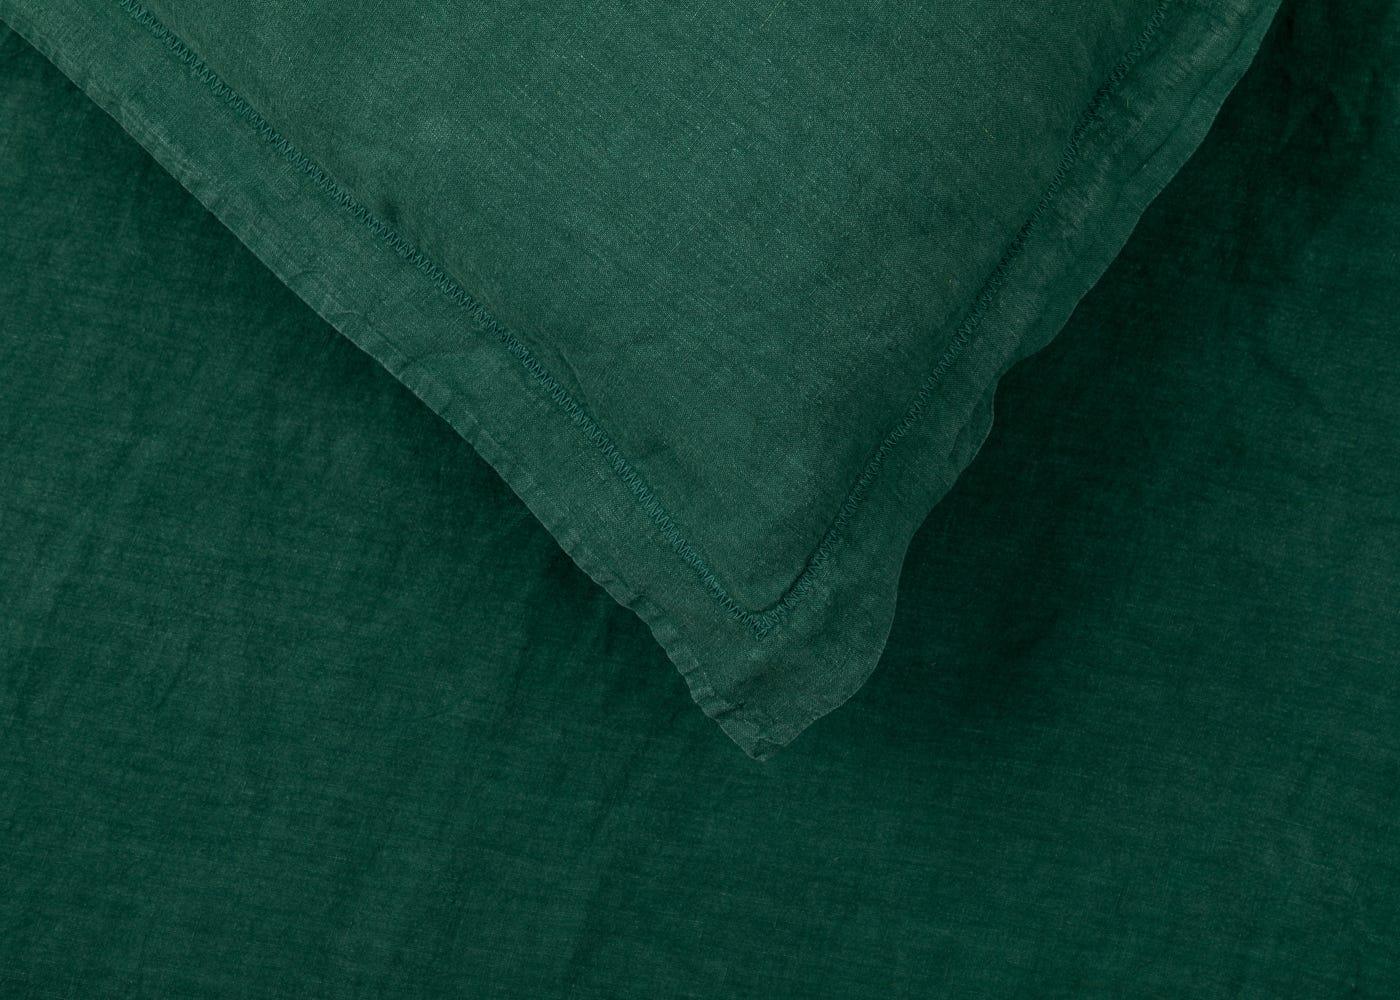 Washed Linen Forest Green Duvet Cover Super King Heal S Uk